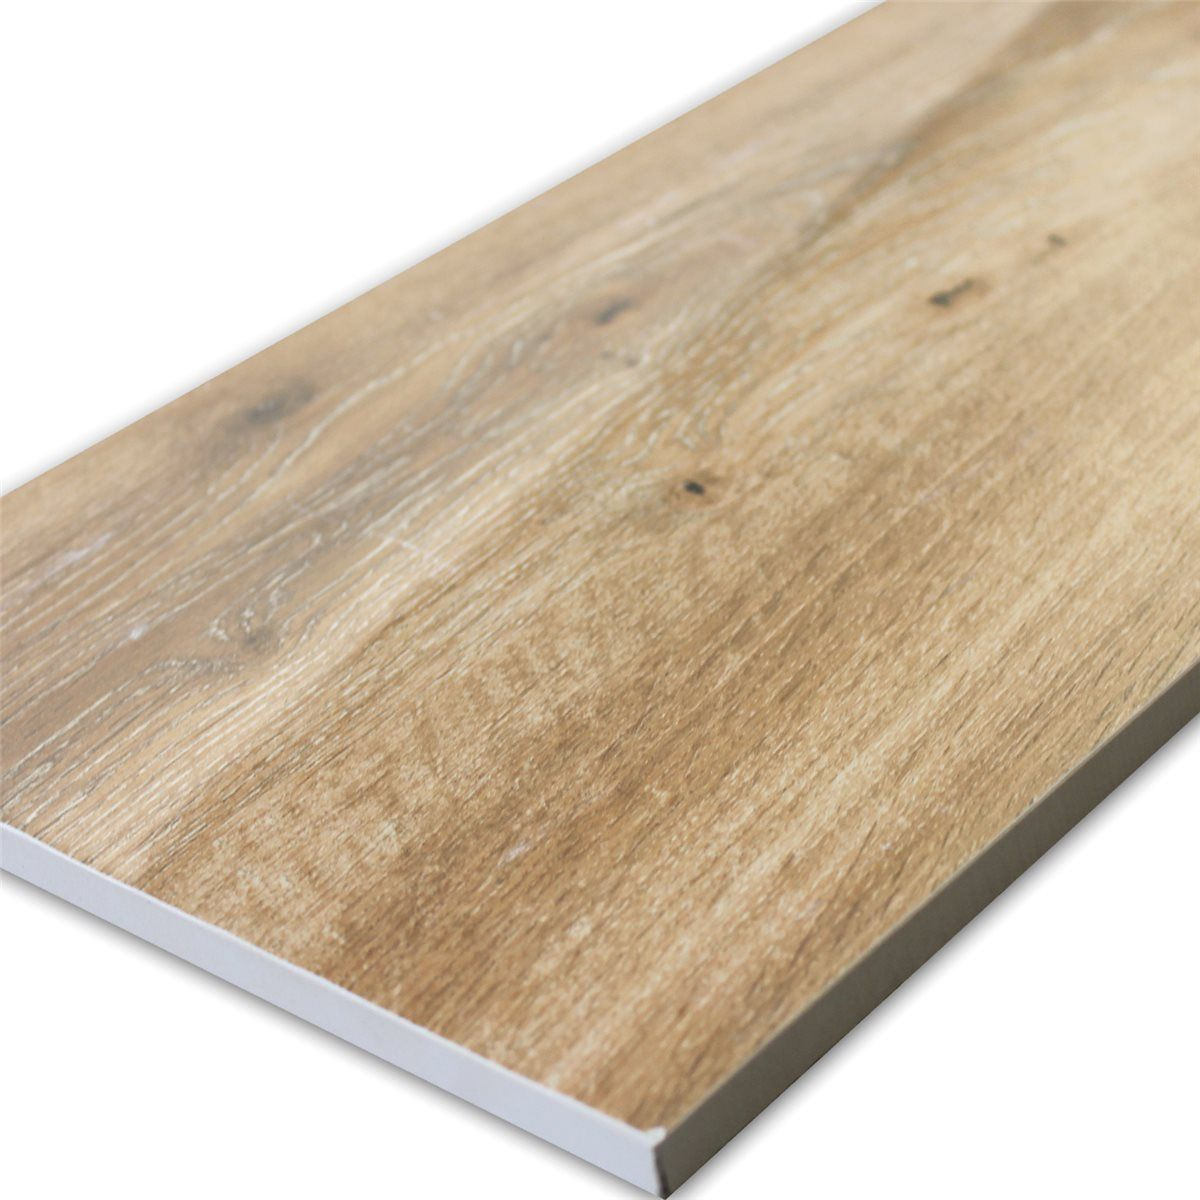 Fliesen Holzoptik: Holzoptik Fliesen Poliert Natura Wood Pine 22x90cm